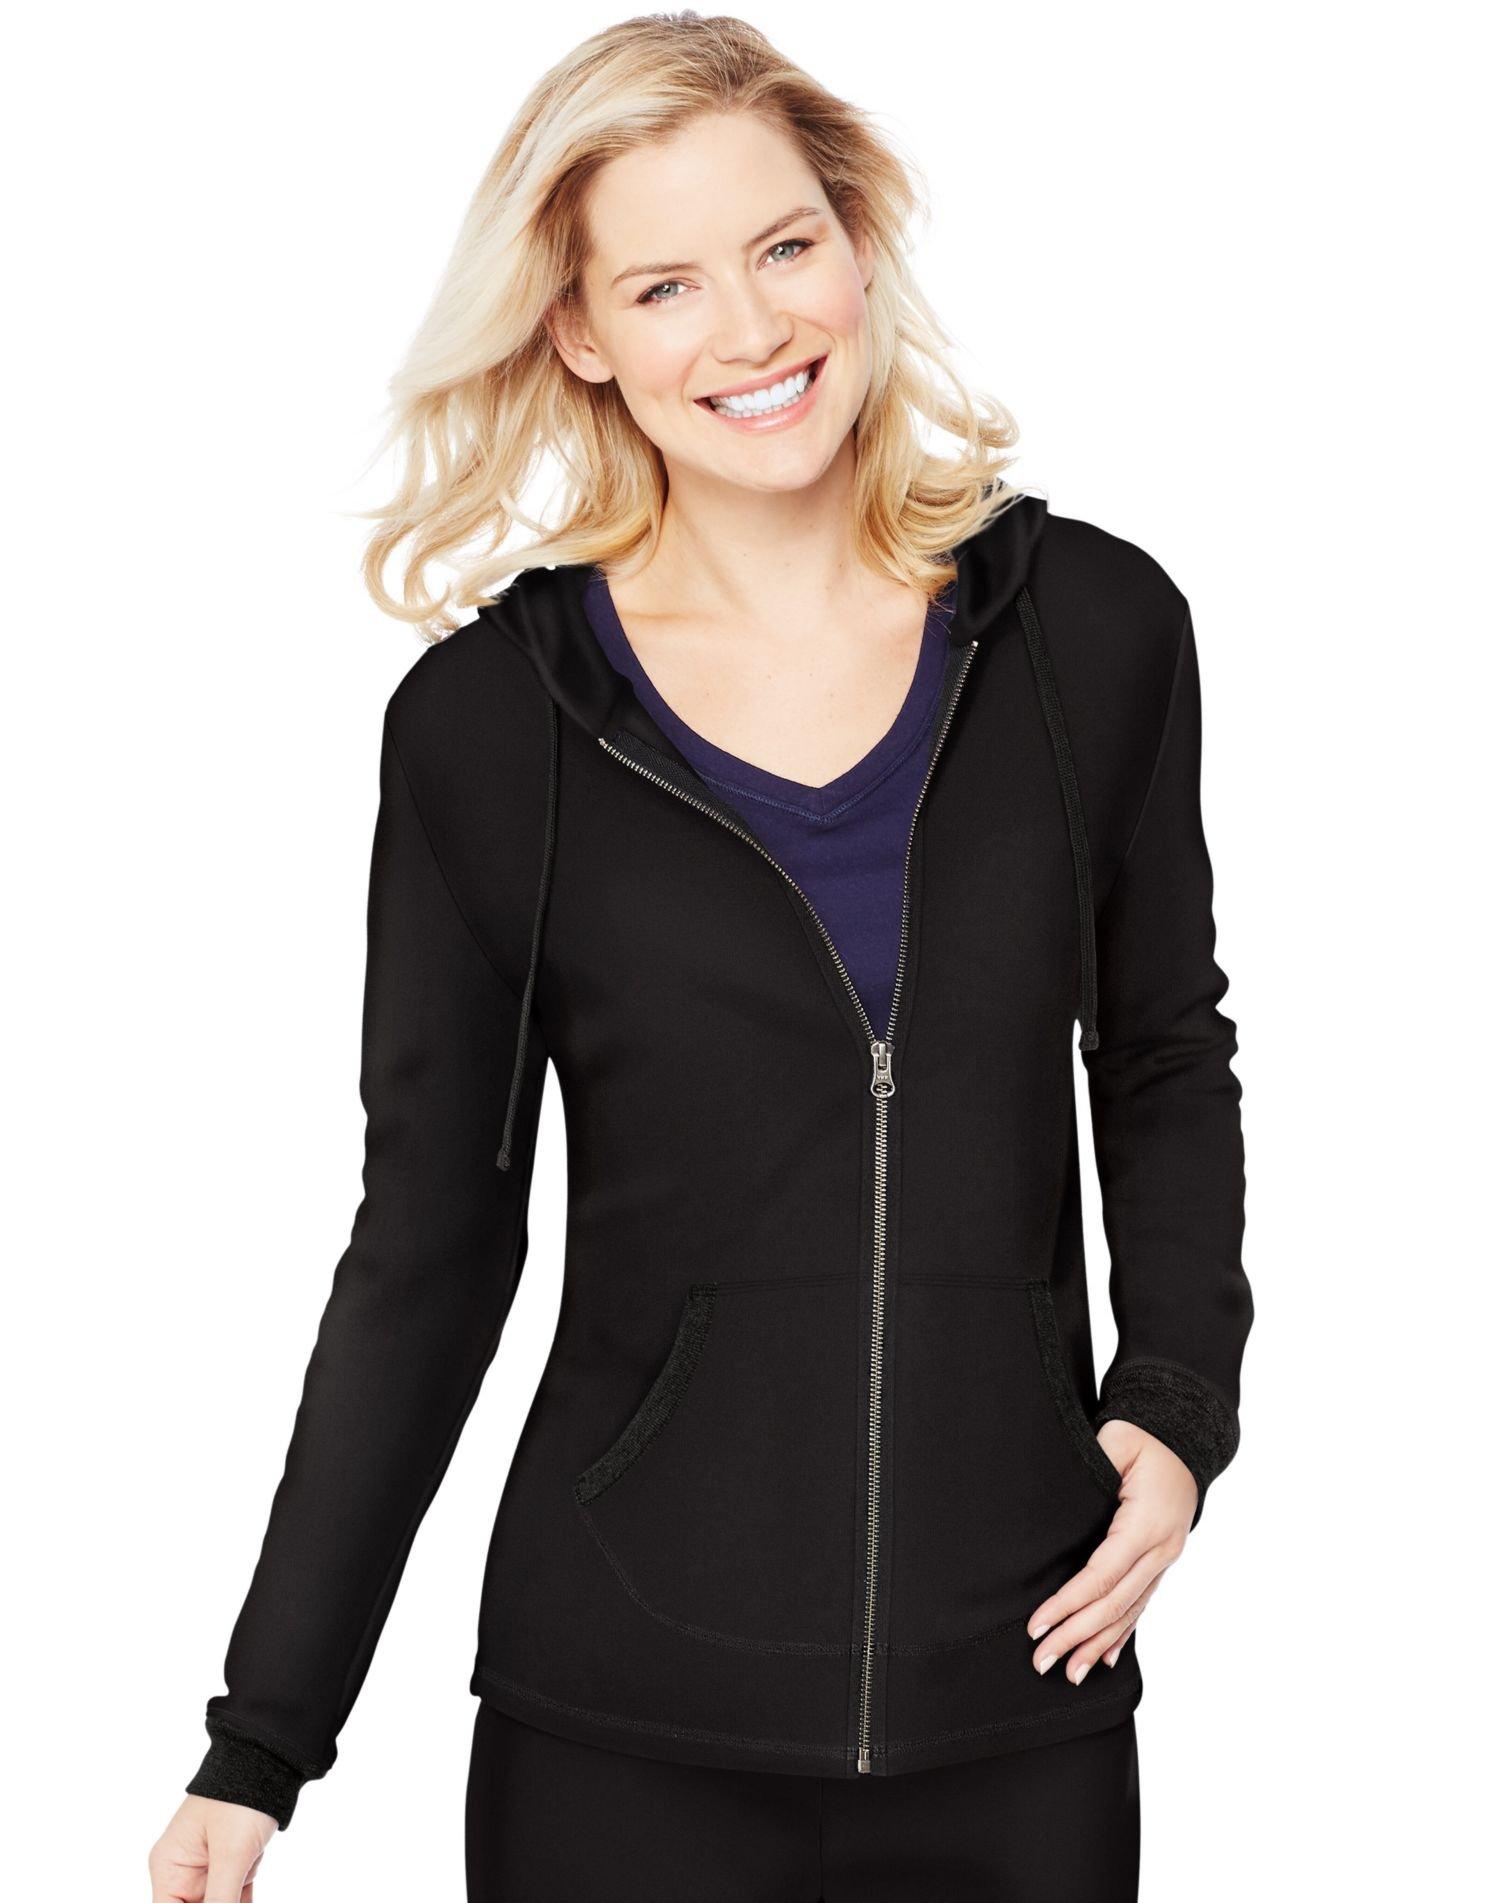 Hanes Women's French Terry Full-Zip Hoodie, Black, Large